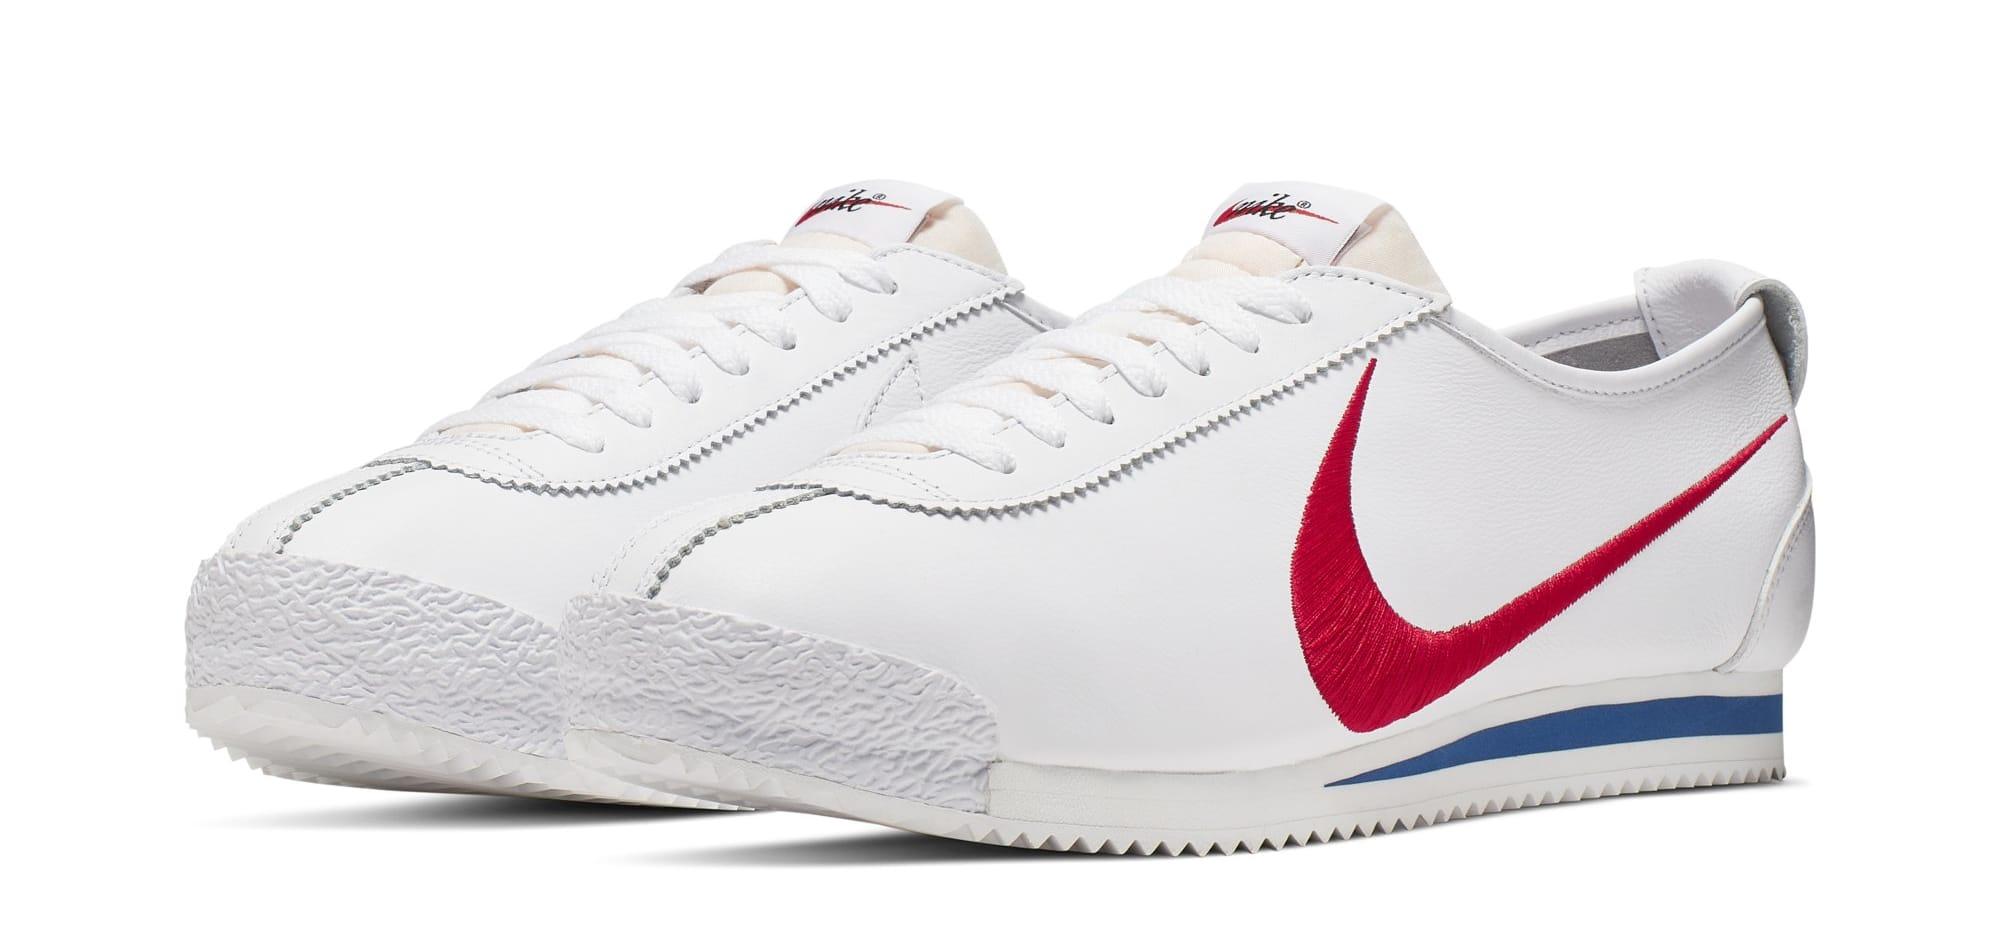 70ce5675c15 Shoe Dog' x Nike Cortez '72 QS 'White/Varsity Red/Game Royal ...